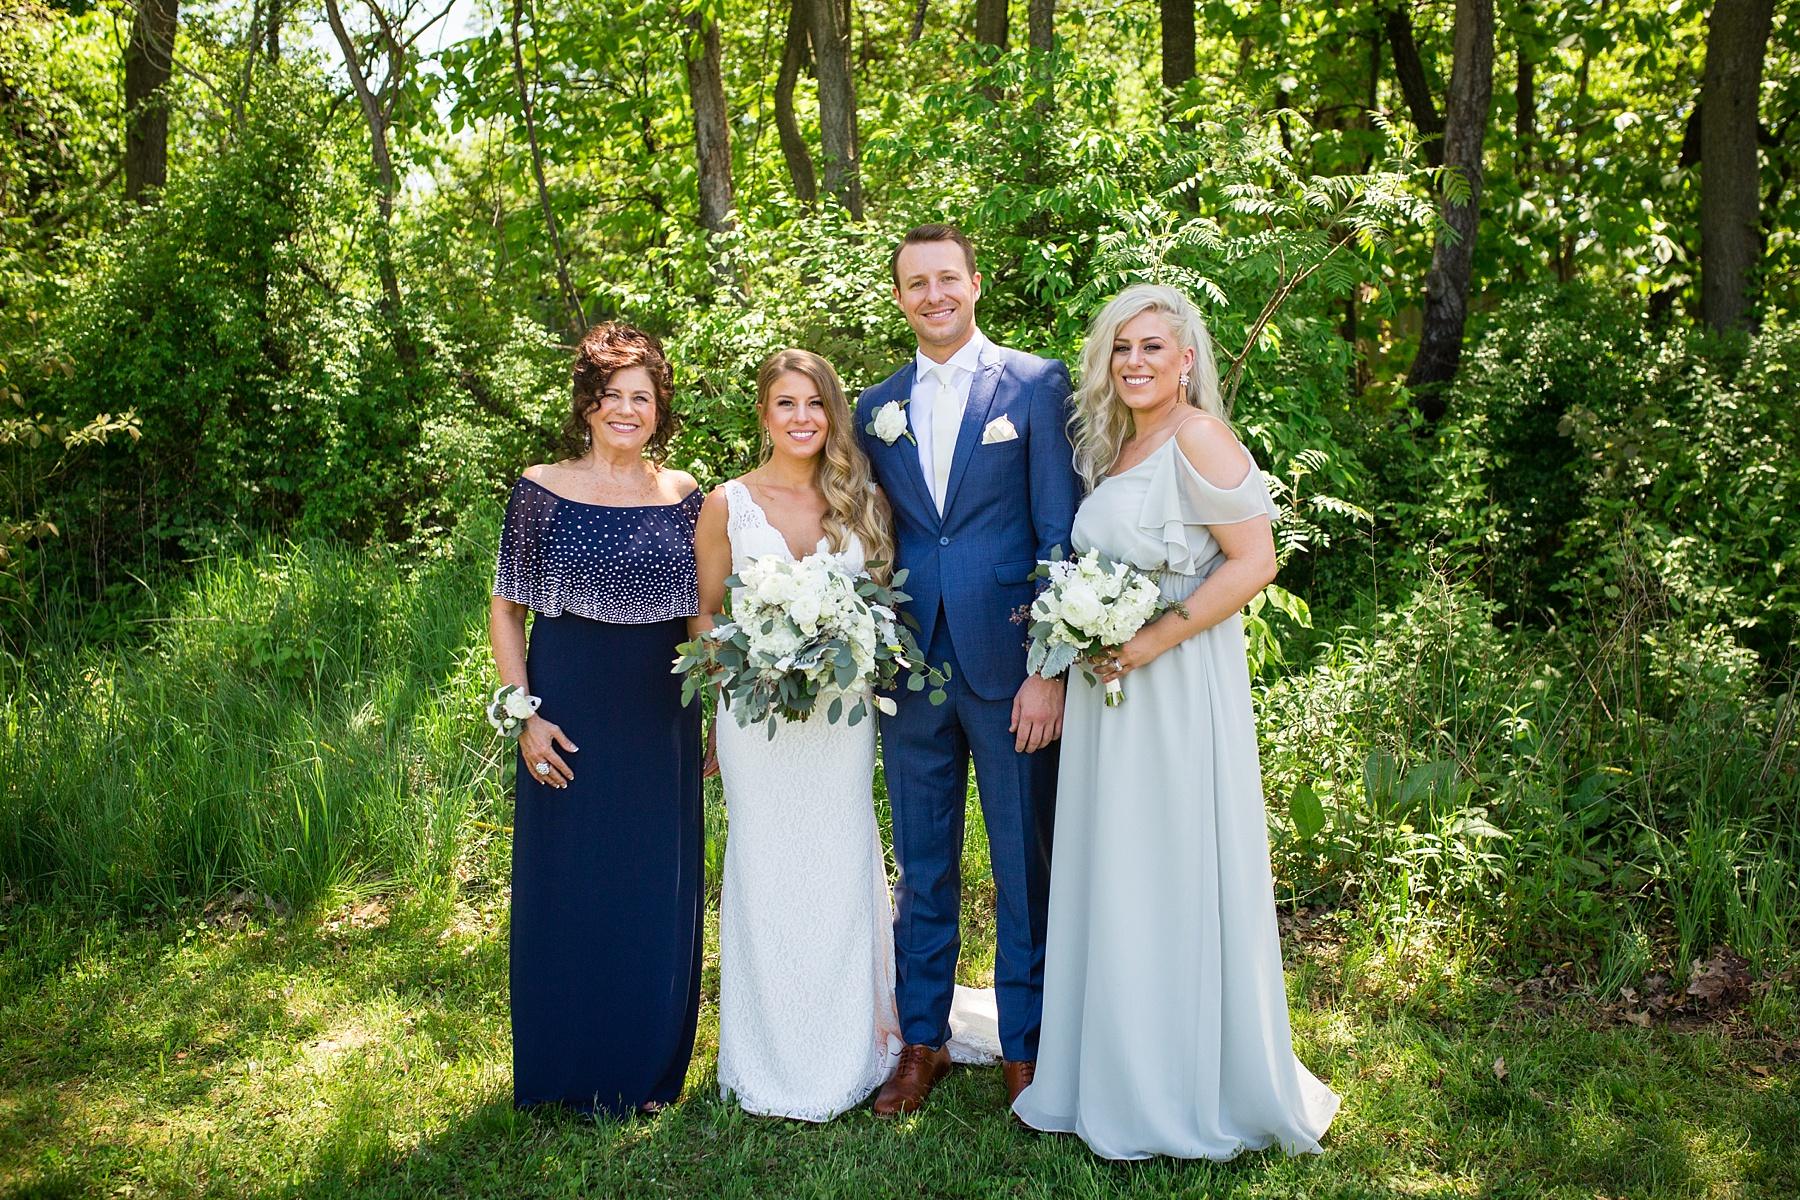 Brandon_Shafer_Photography_Kara_Doug_12_corners_Wedding_Benton_Harbor_0028.jpg